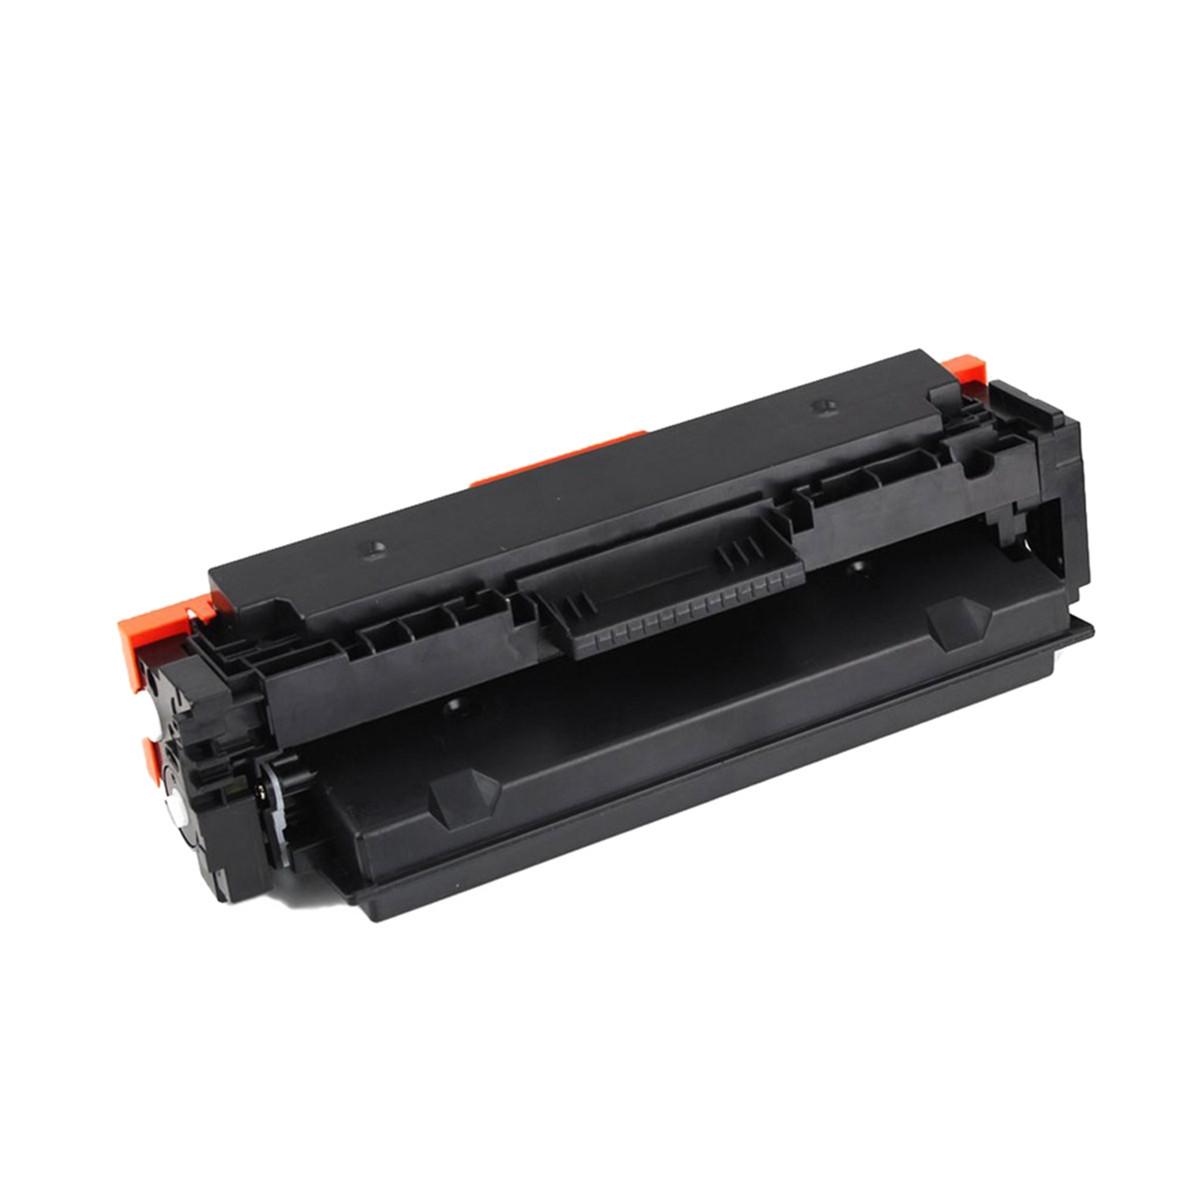 Toner Compatível com HP CF412A Amarelo | M452DW 452DN M477FDW M477FNW M477FDN | Premium Quality 2.3k